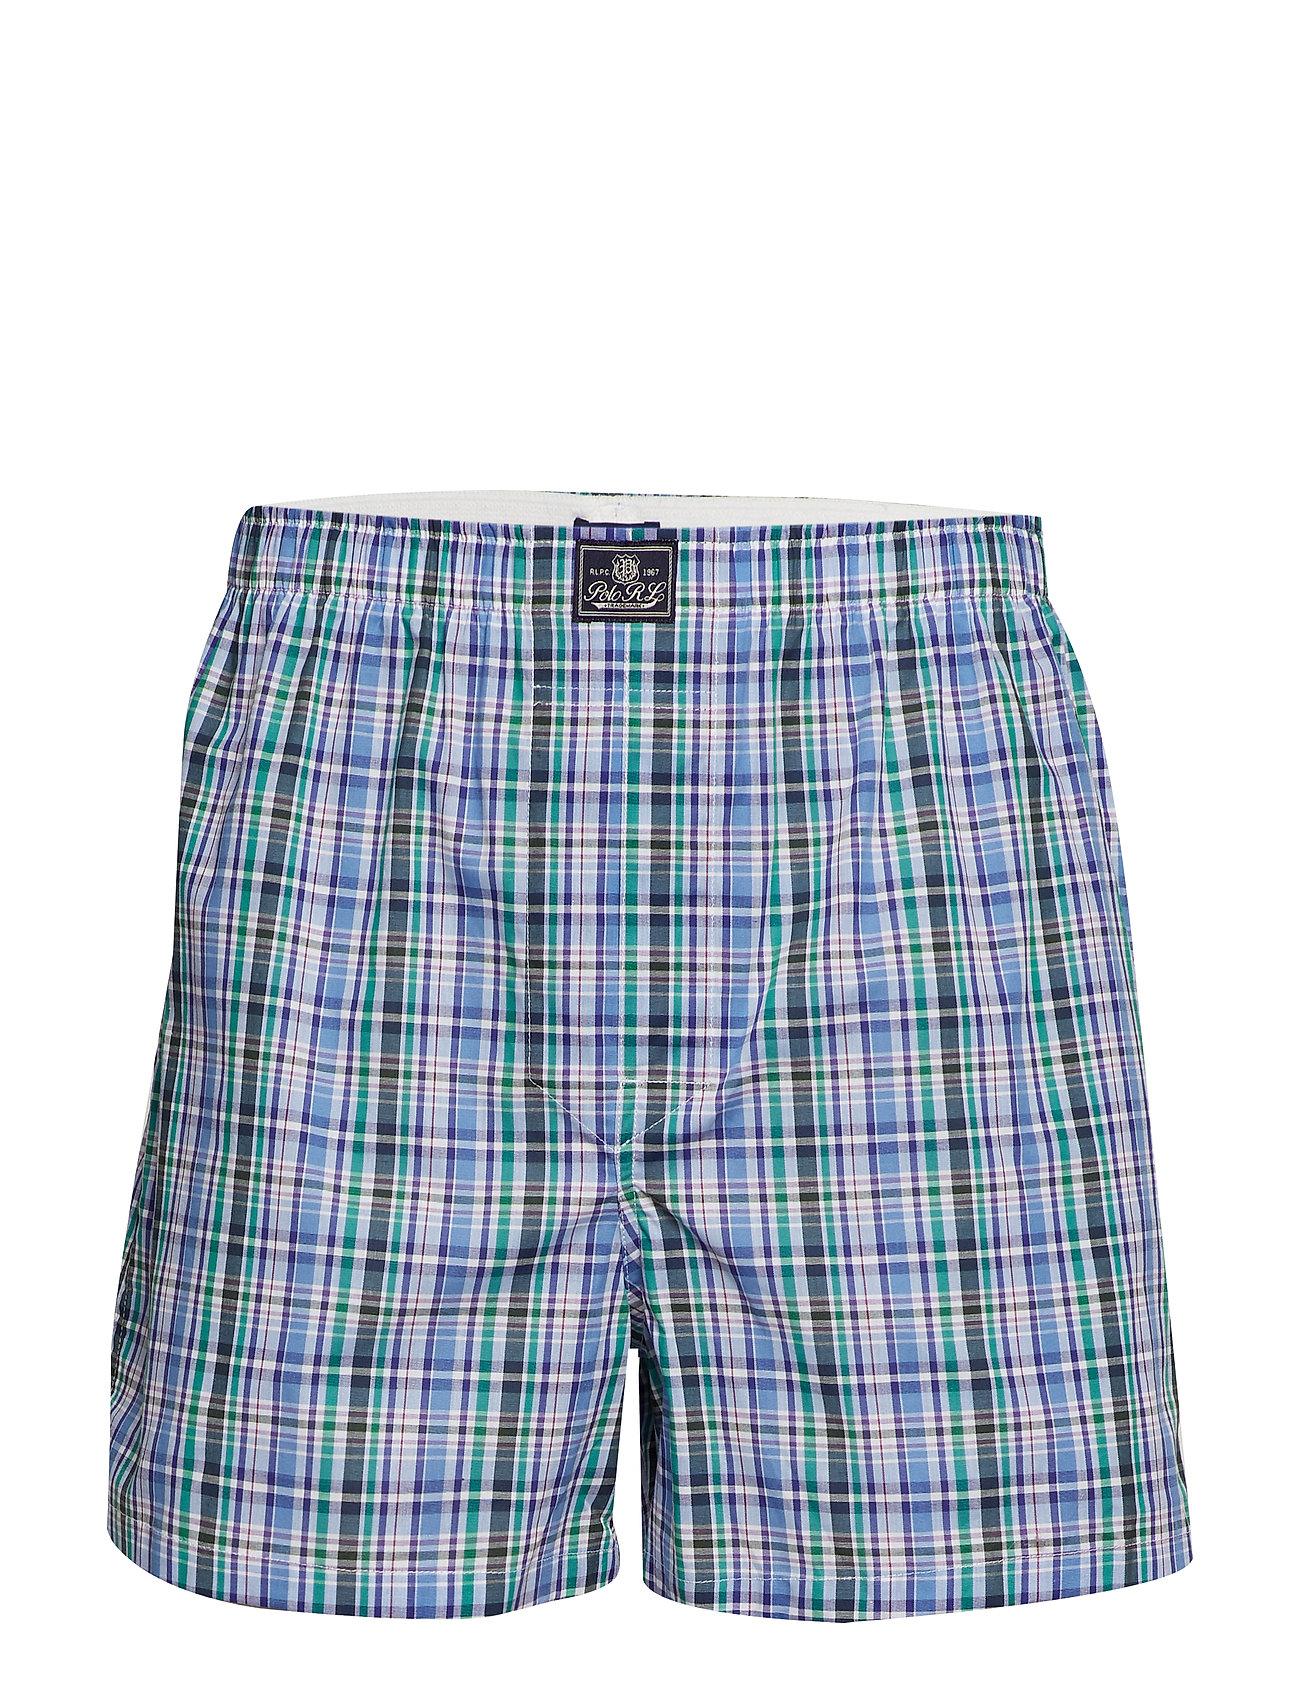 Lauren 3 Open boxerlake PldMoss Boxer Underwear Ralph Pack PPolo rdxQWCeBo